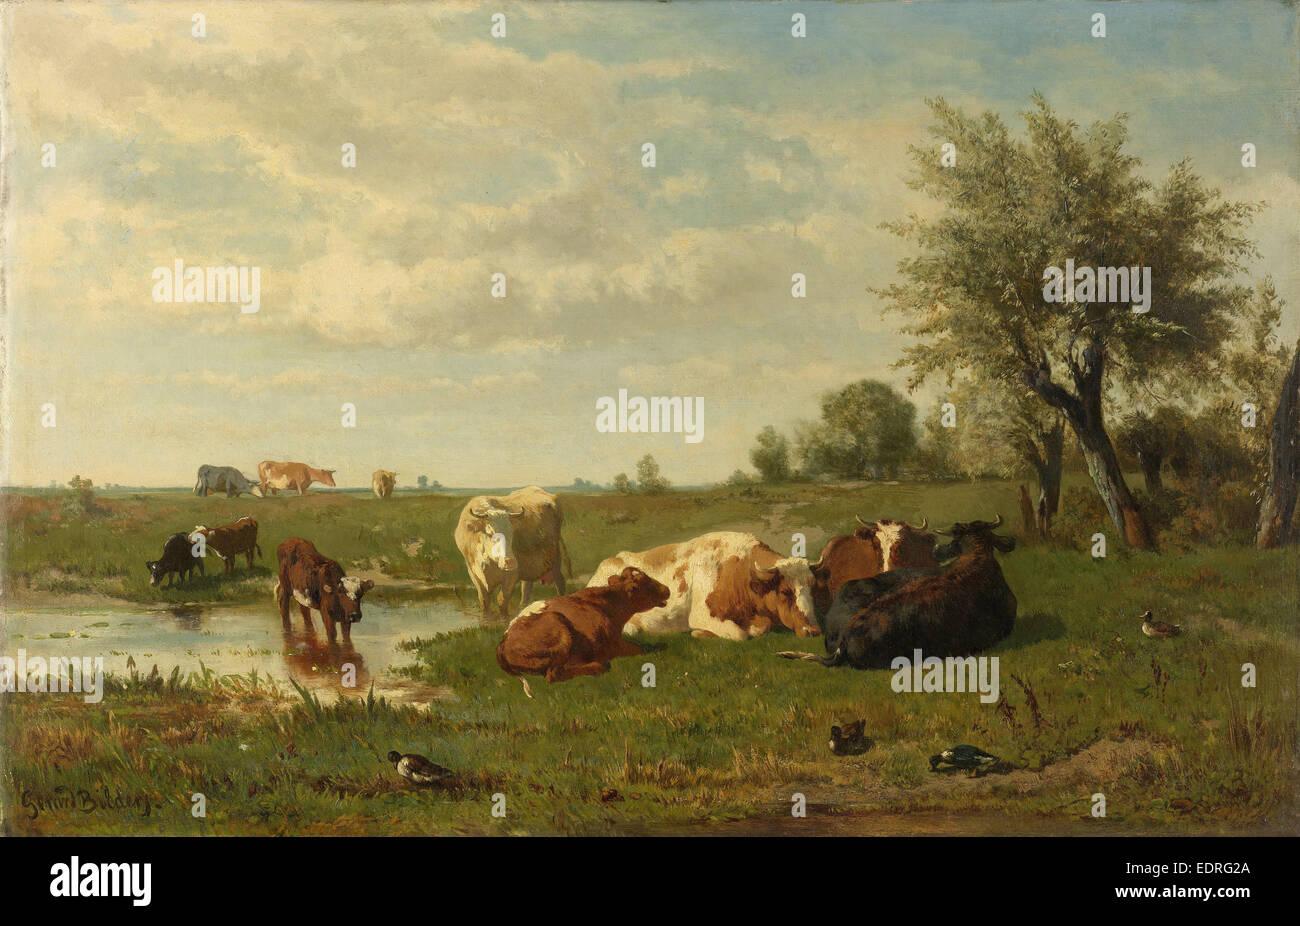 1860 1865 stock photos & 1860 1865 stock images - alamy